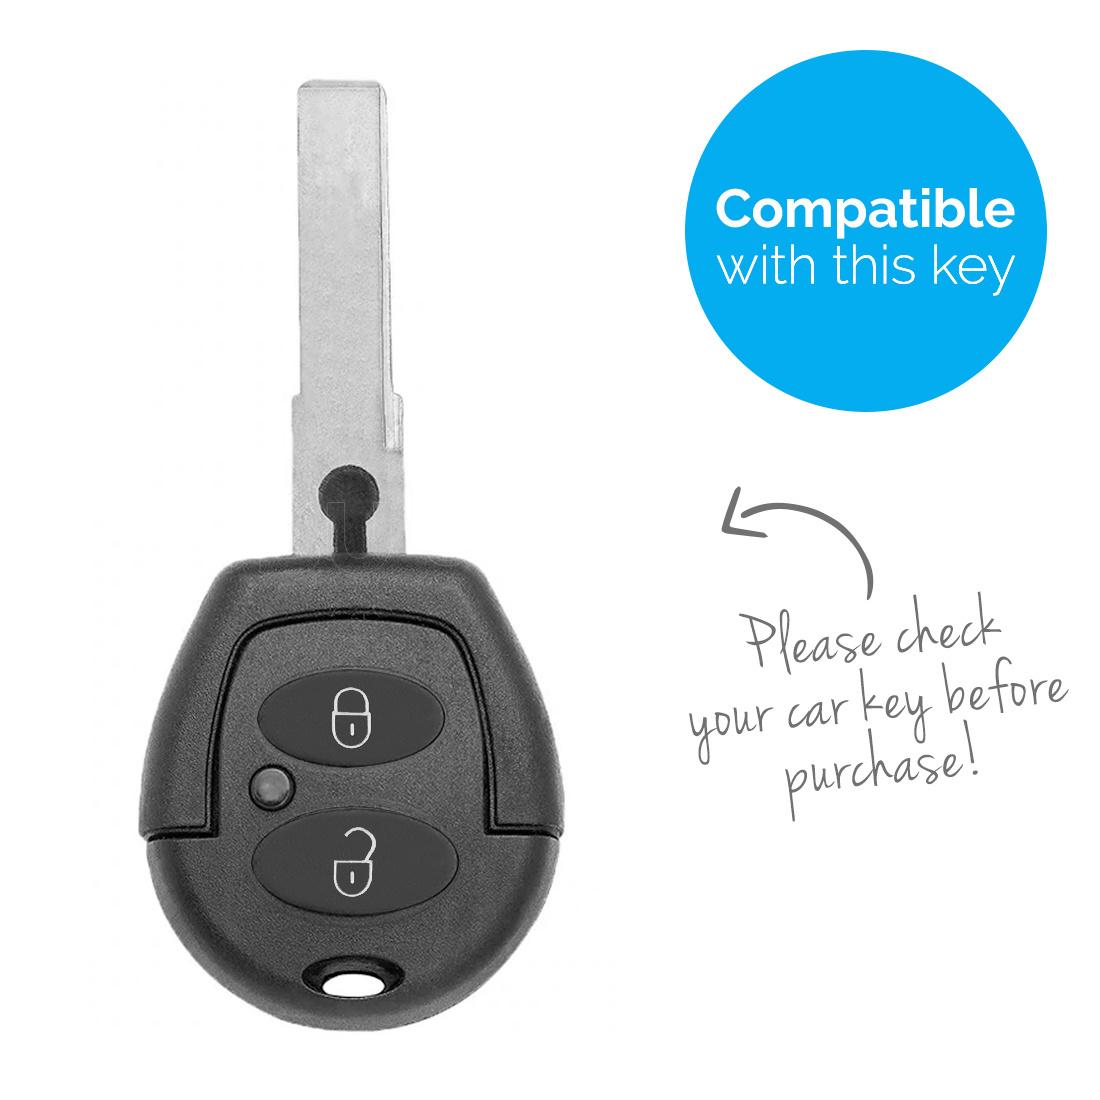 TBU car TBU car Autoschlüssel Hülle kompatibel mit Seat 2 Tasten - Schutzhülle aus Silikon - Auto Schlüsselhülle Cover in Schwarz